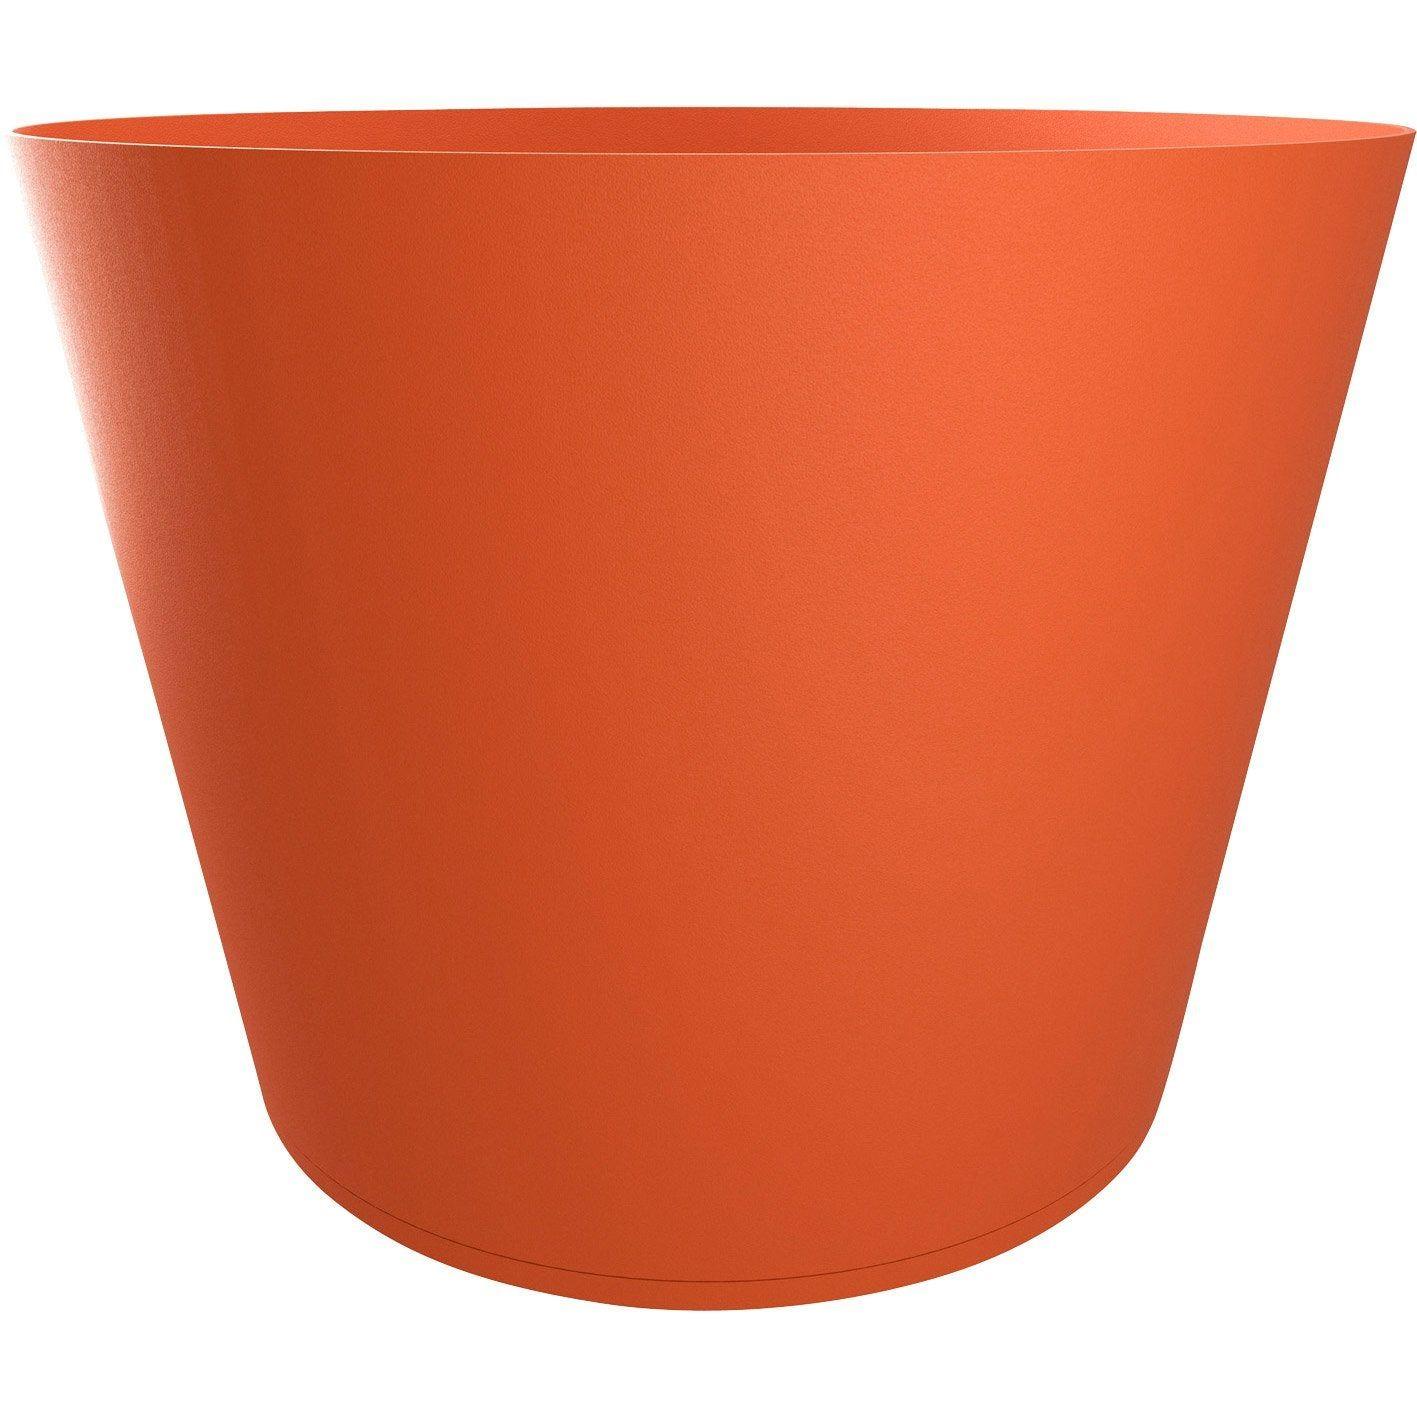 Bac Plastique Grosfillex Diam80 X H575 Cm Orange Brûlé In